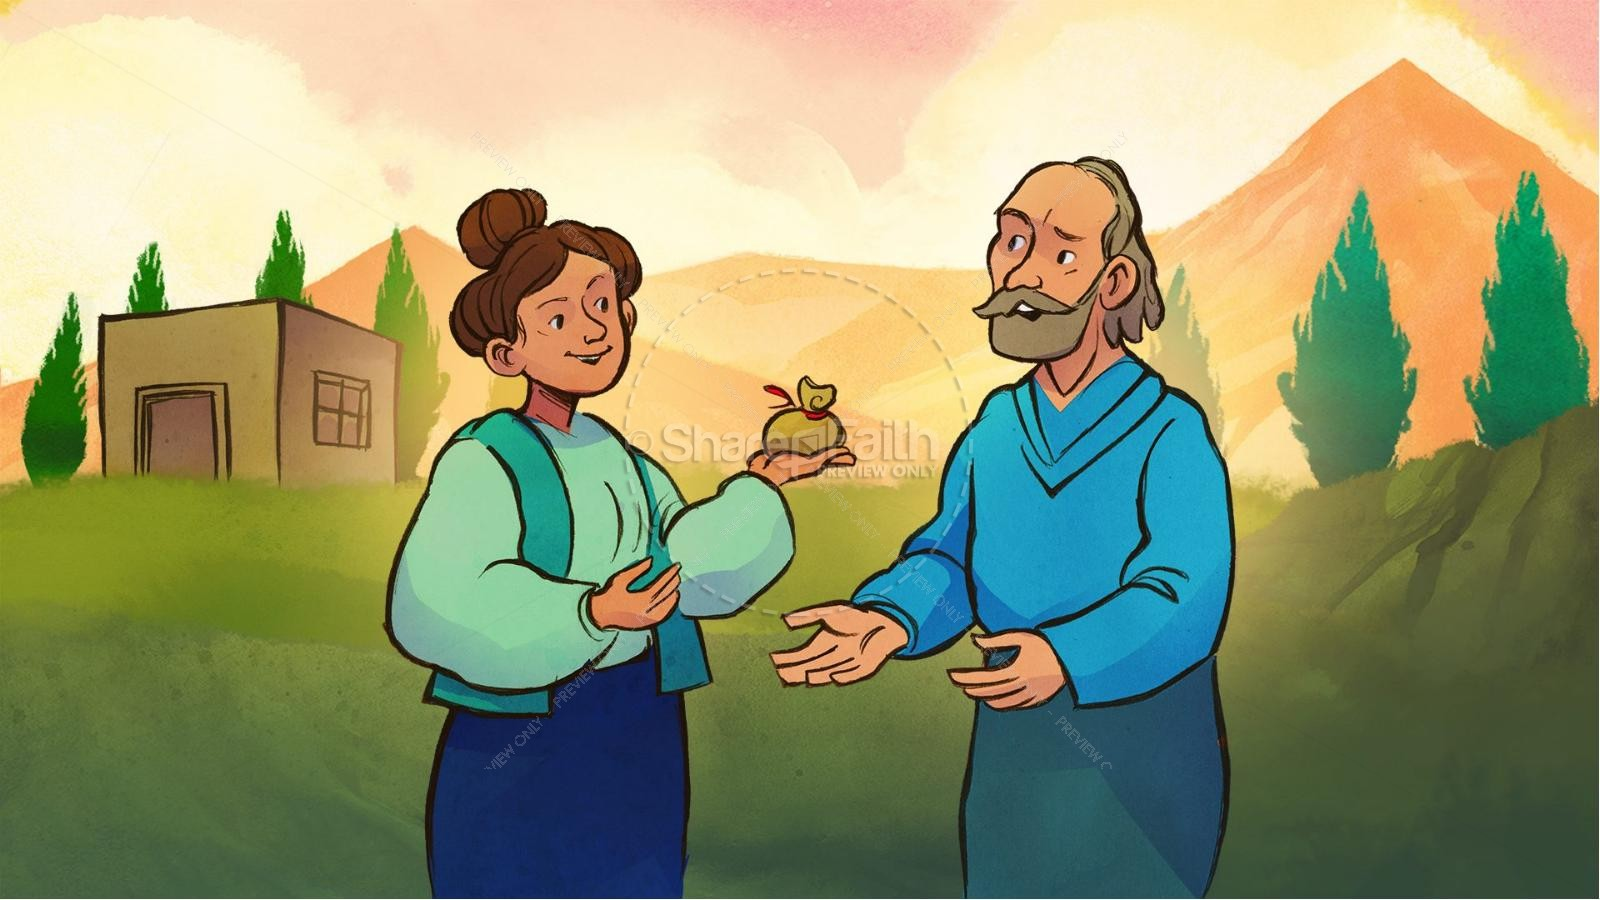 Acts 5 Ananias and Sapphira Kids Bible Stories | slide 2